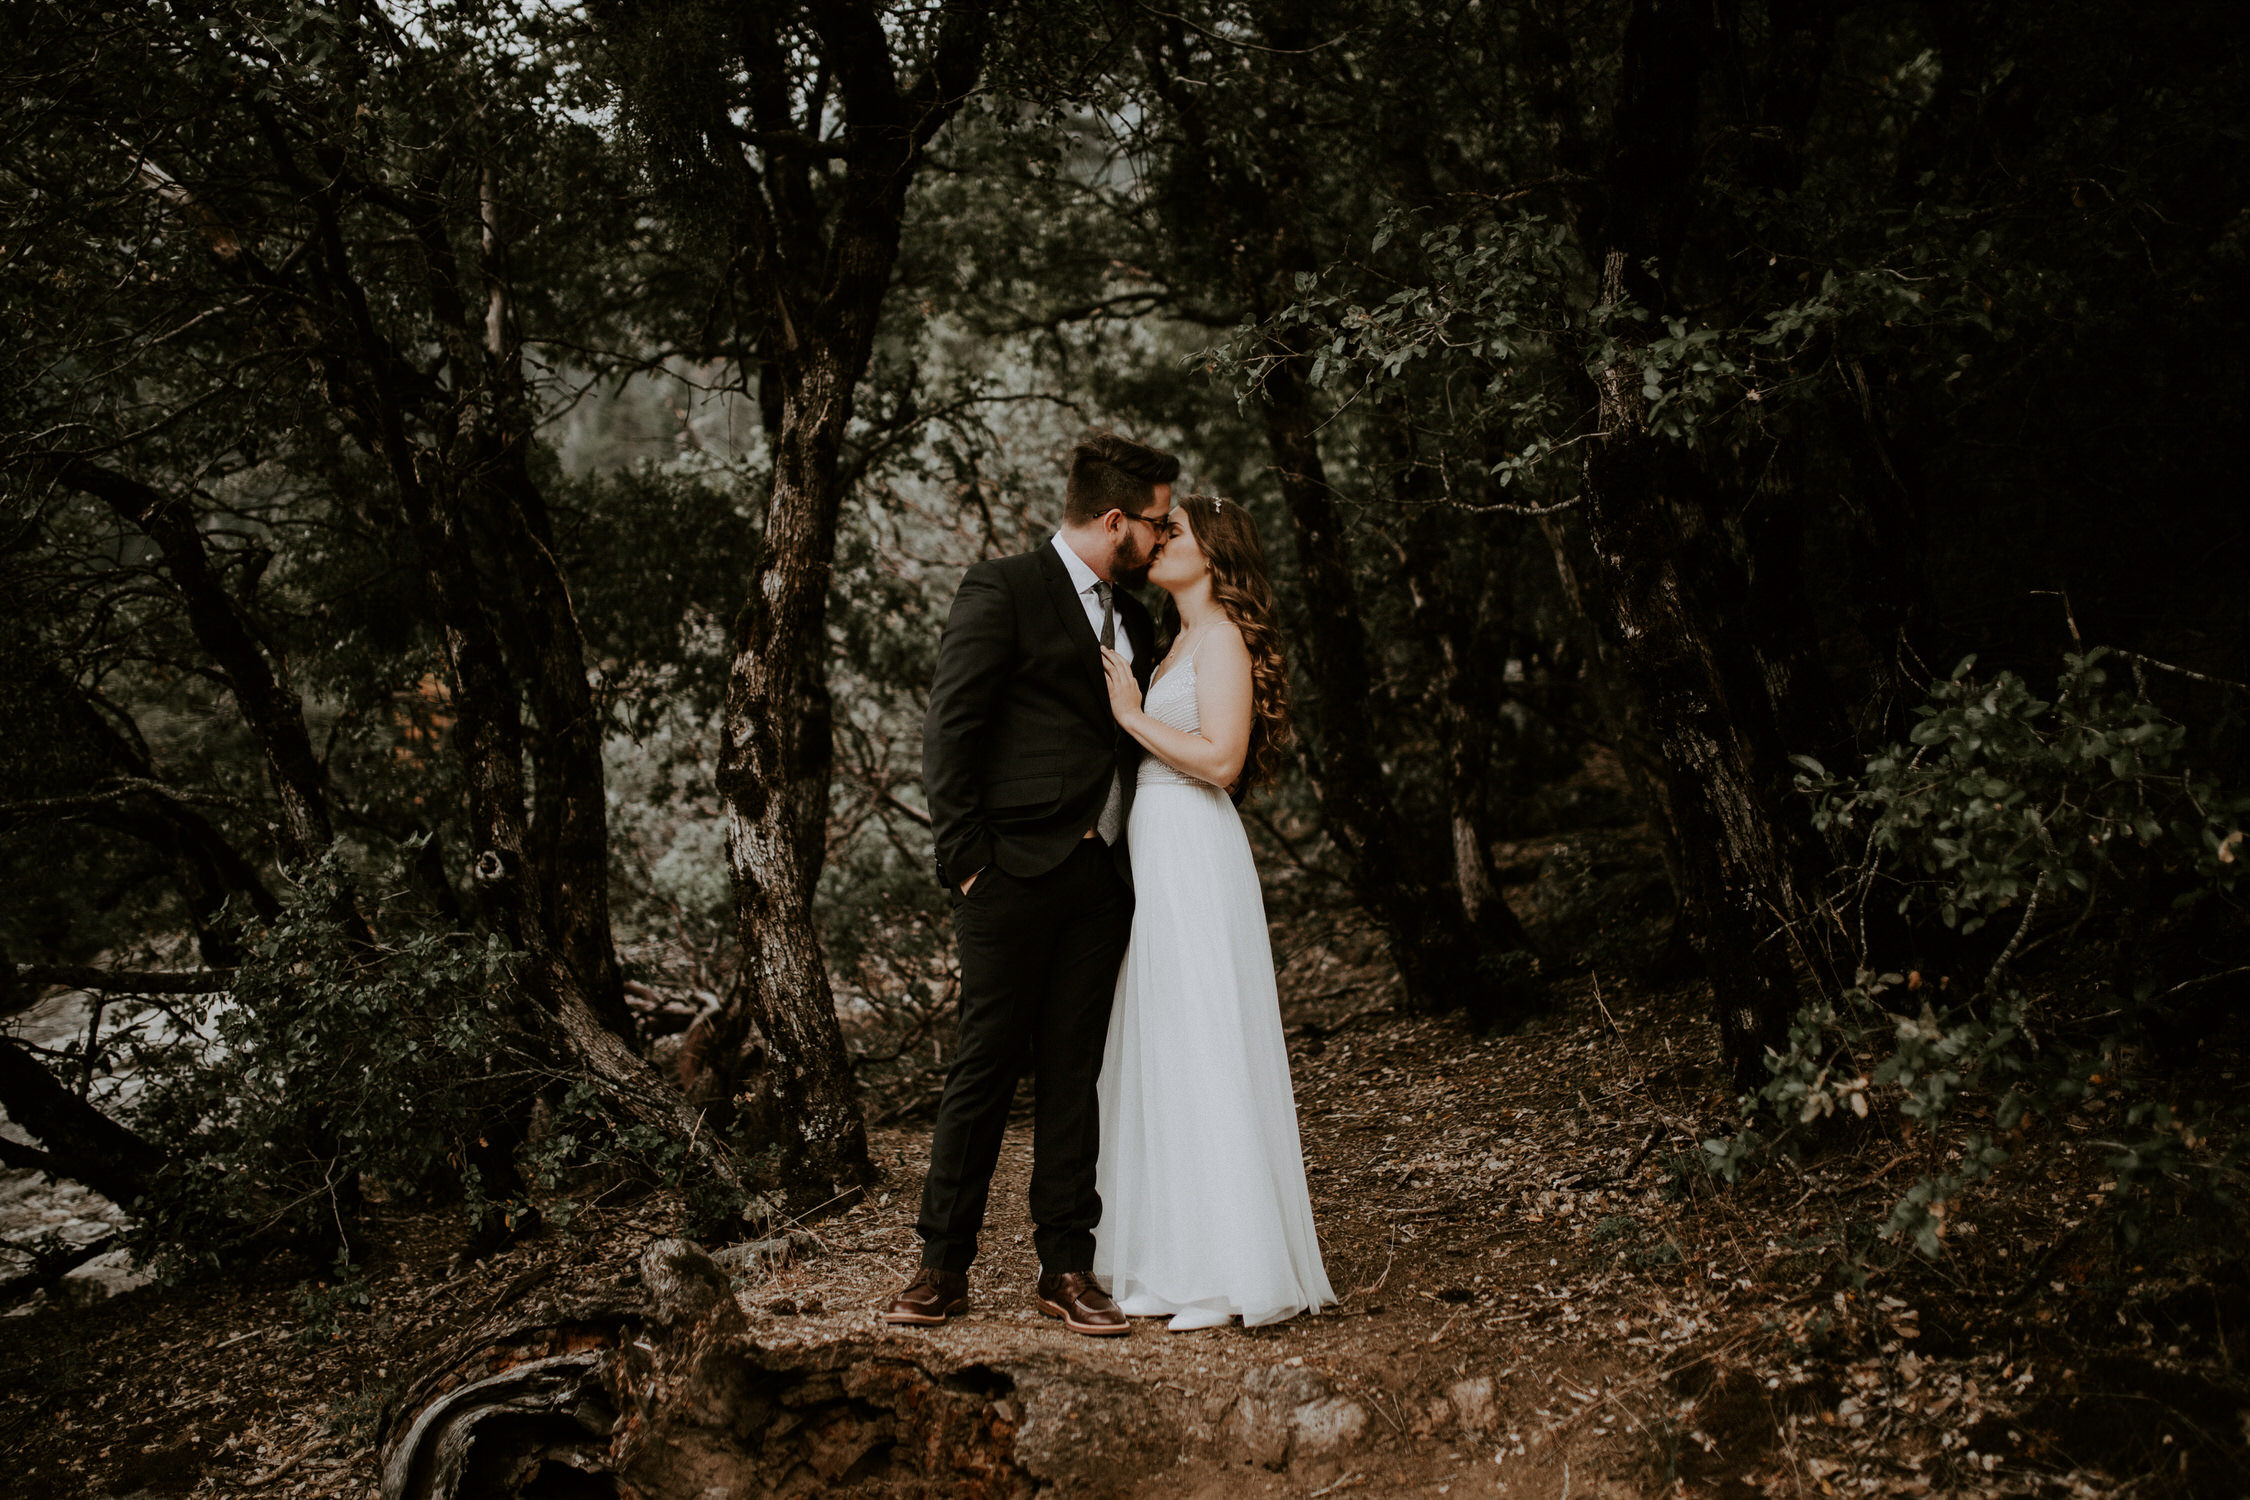 intimate-couple-elopement-yosemite-58.jpg